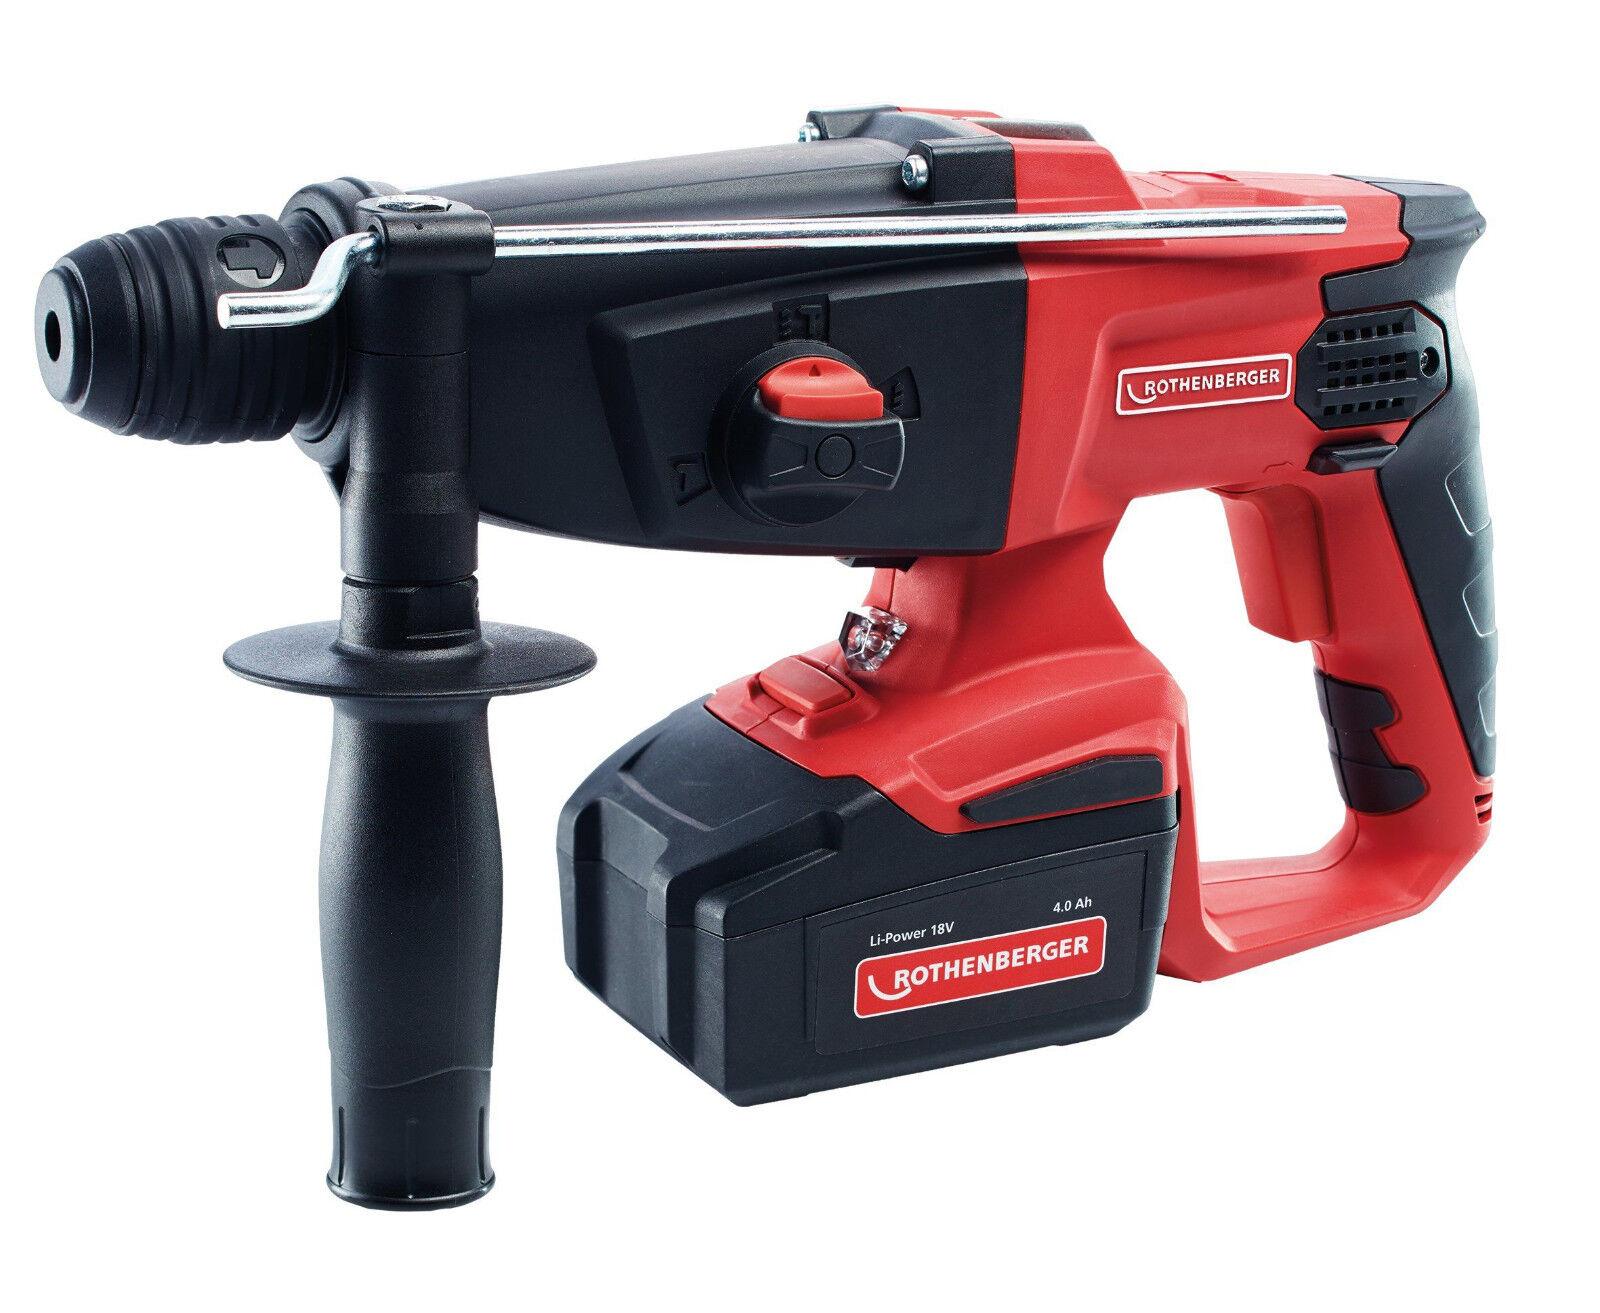 Rothenberger Akku-Kombibohrhammer RO RH4000 18V mit Akku + Ladegerät